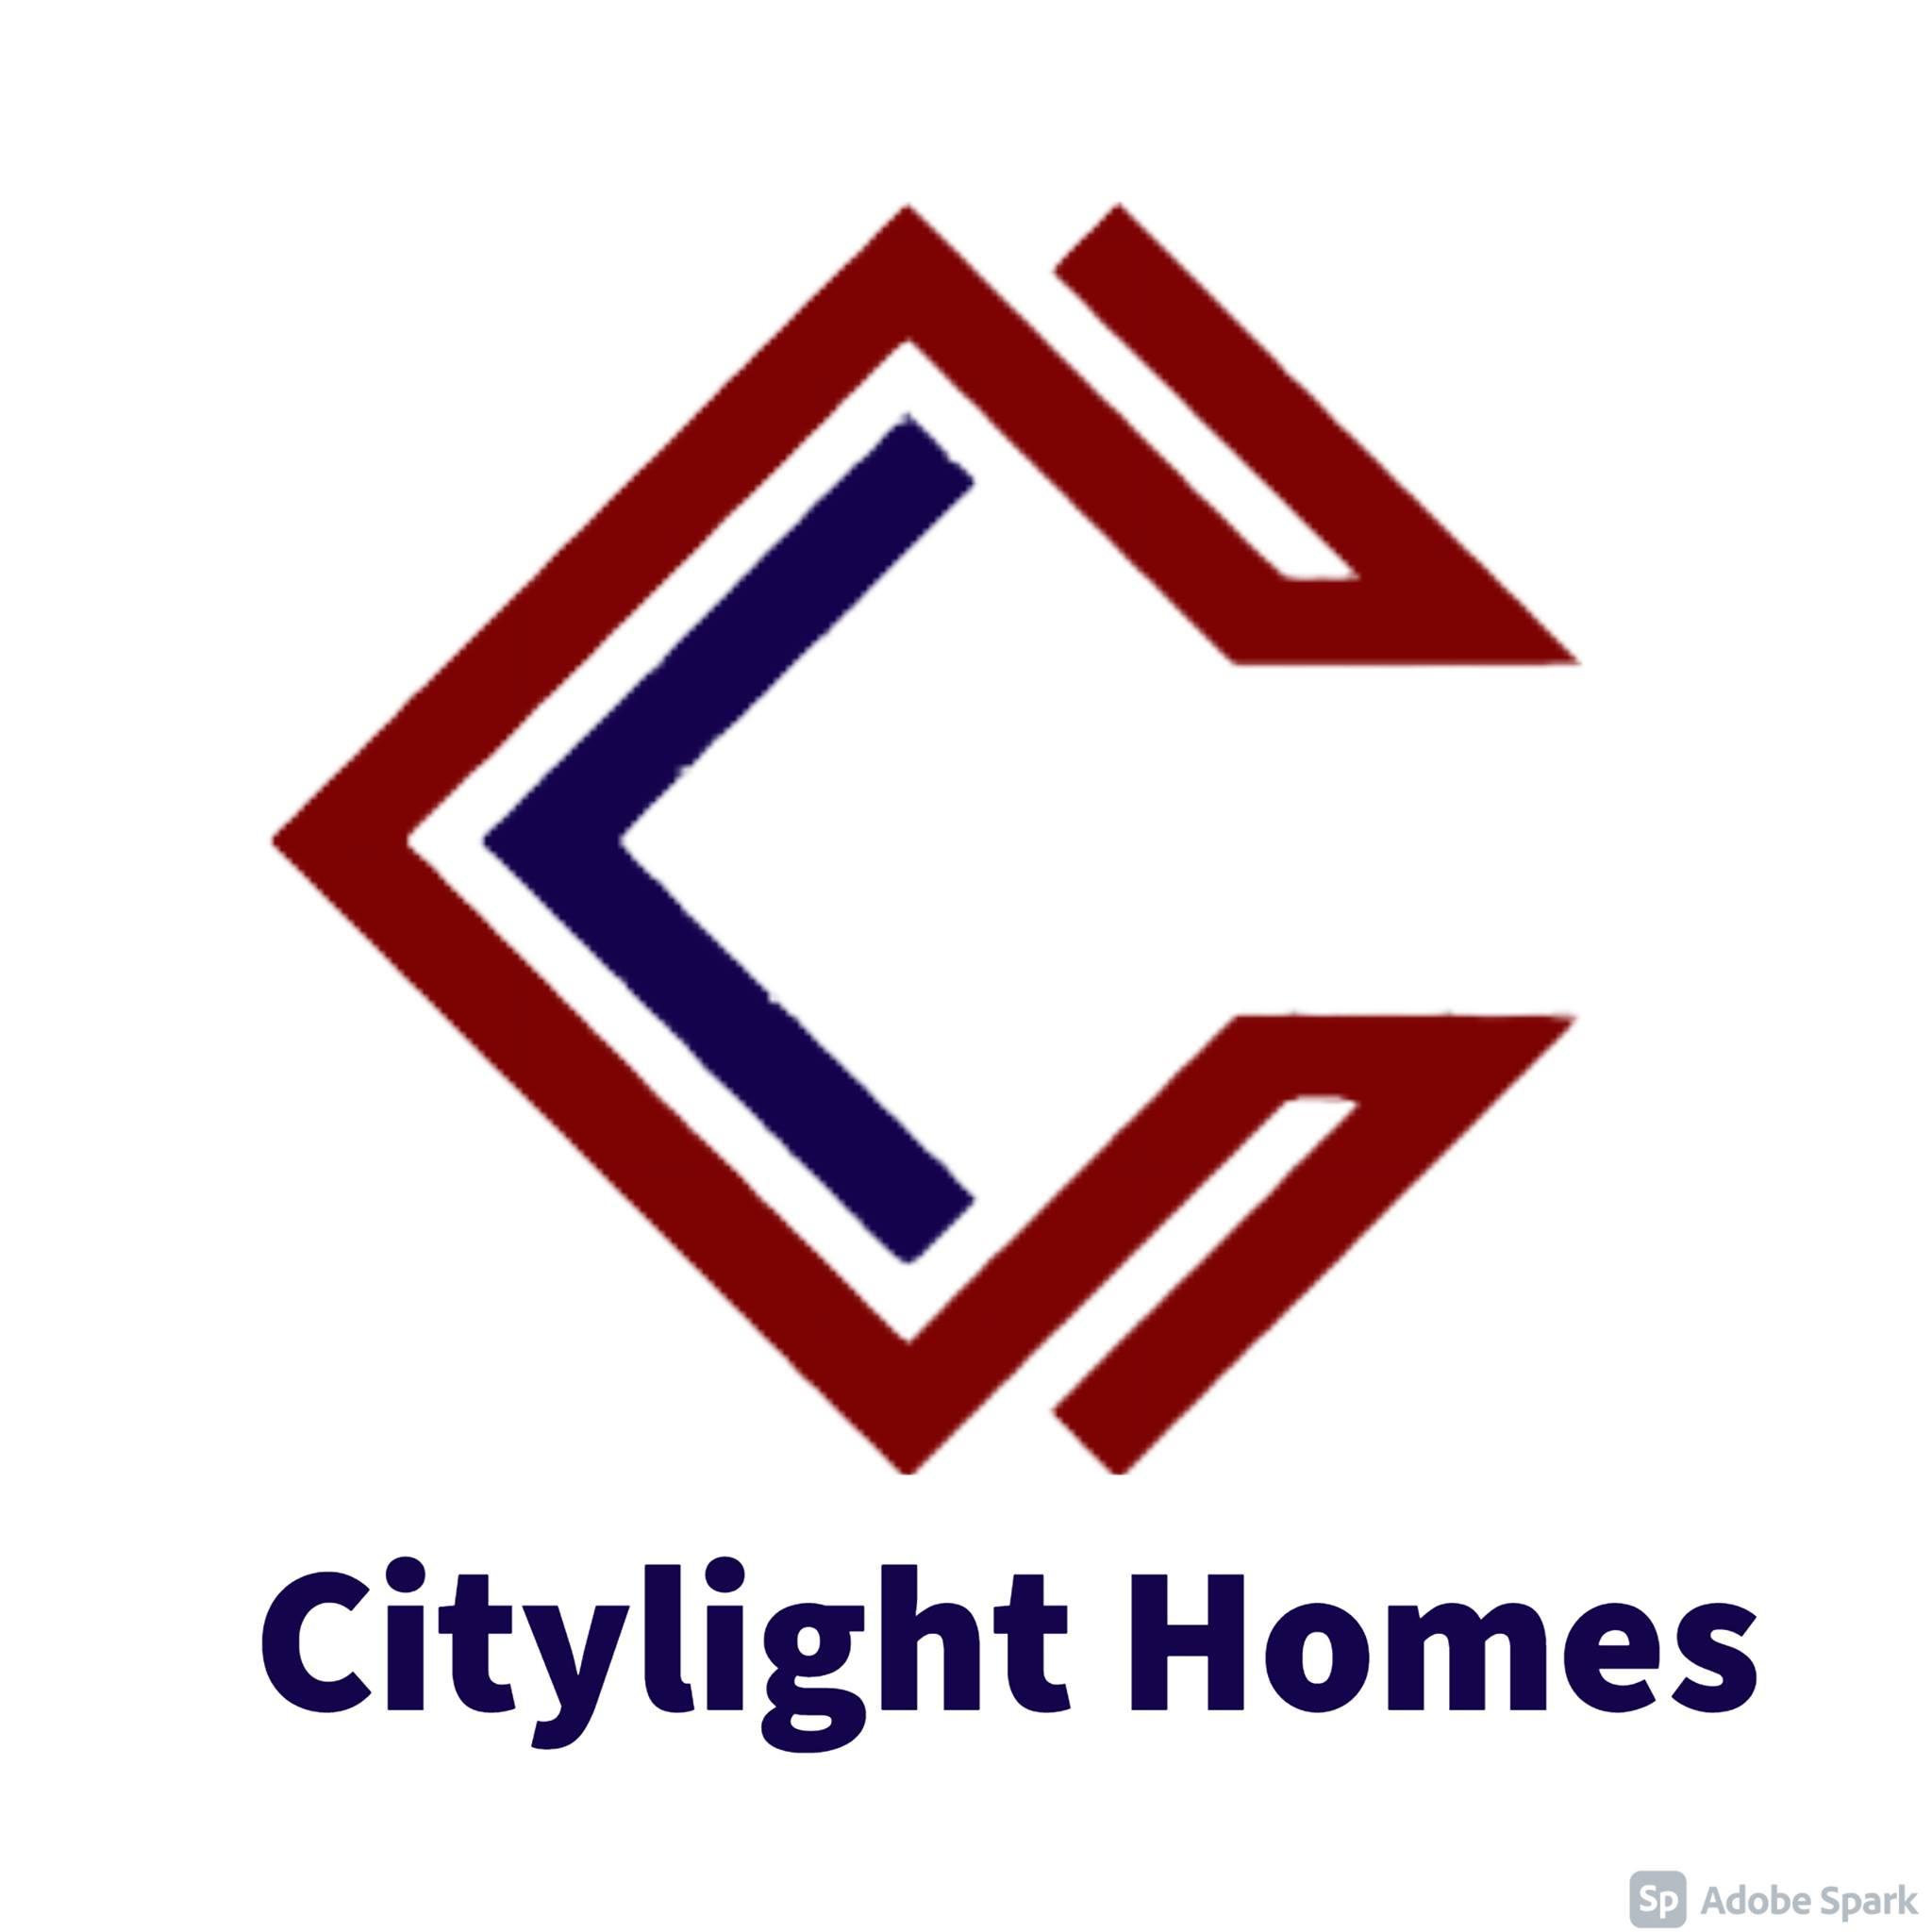 Citylight Homes - Coliving Company